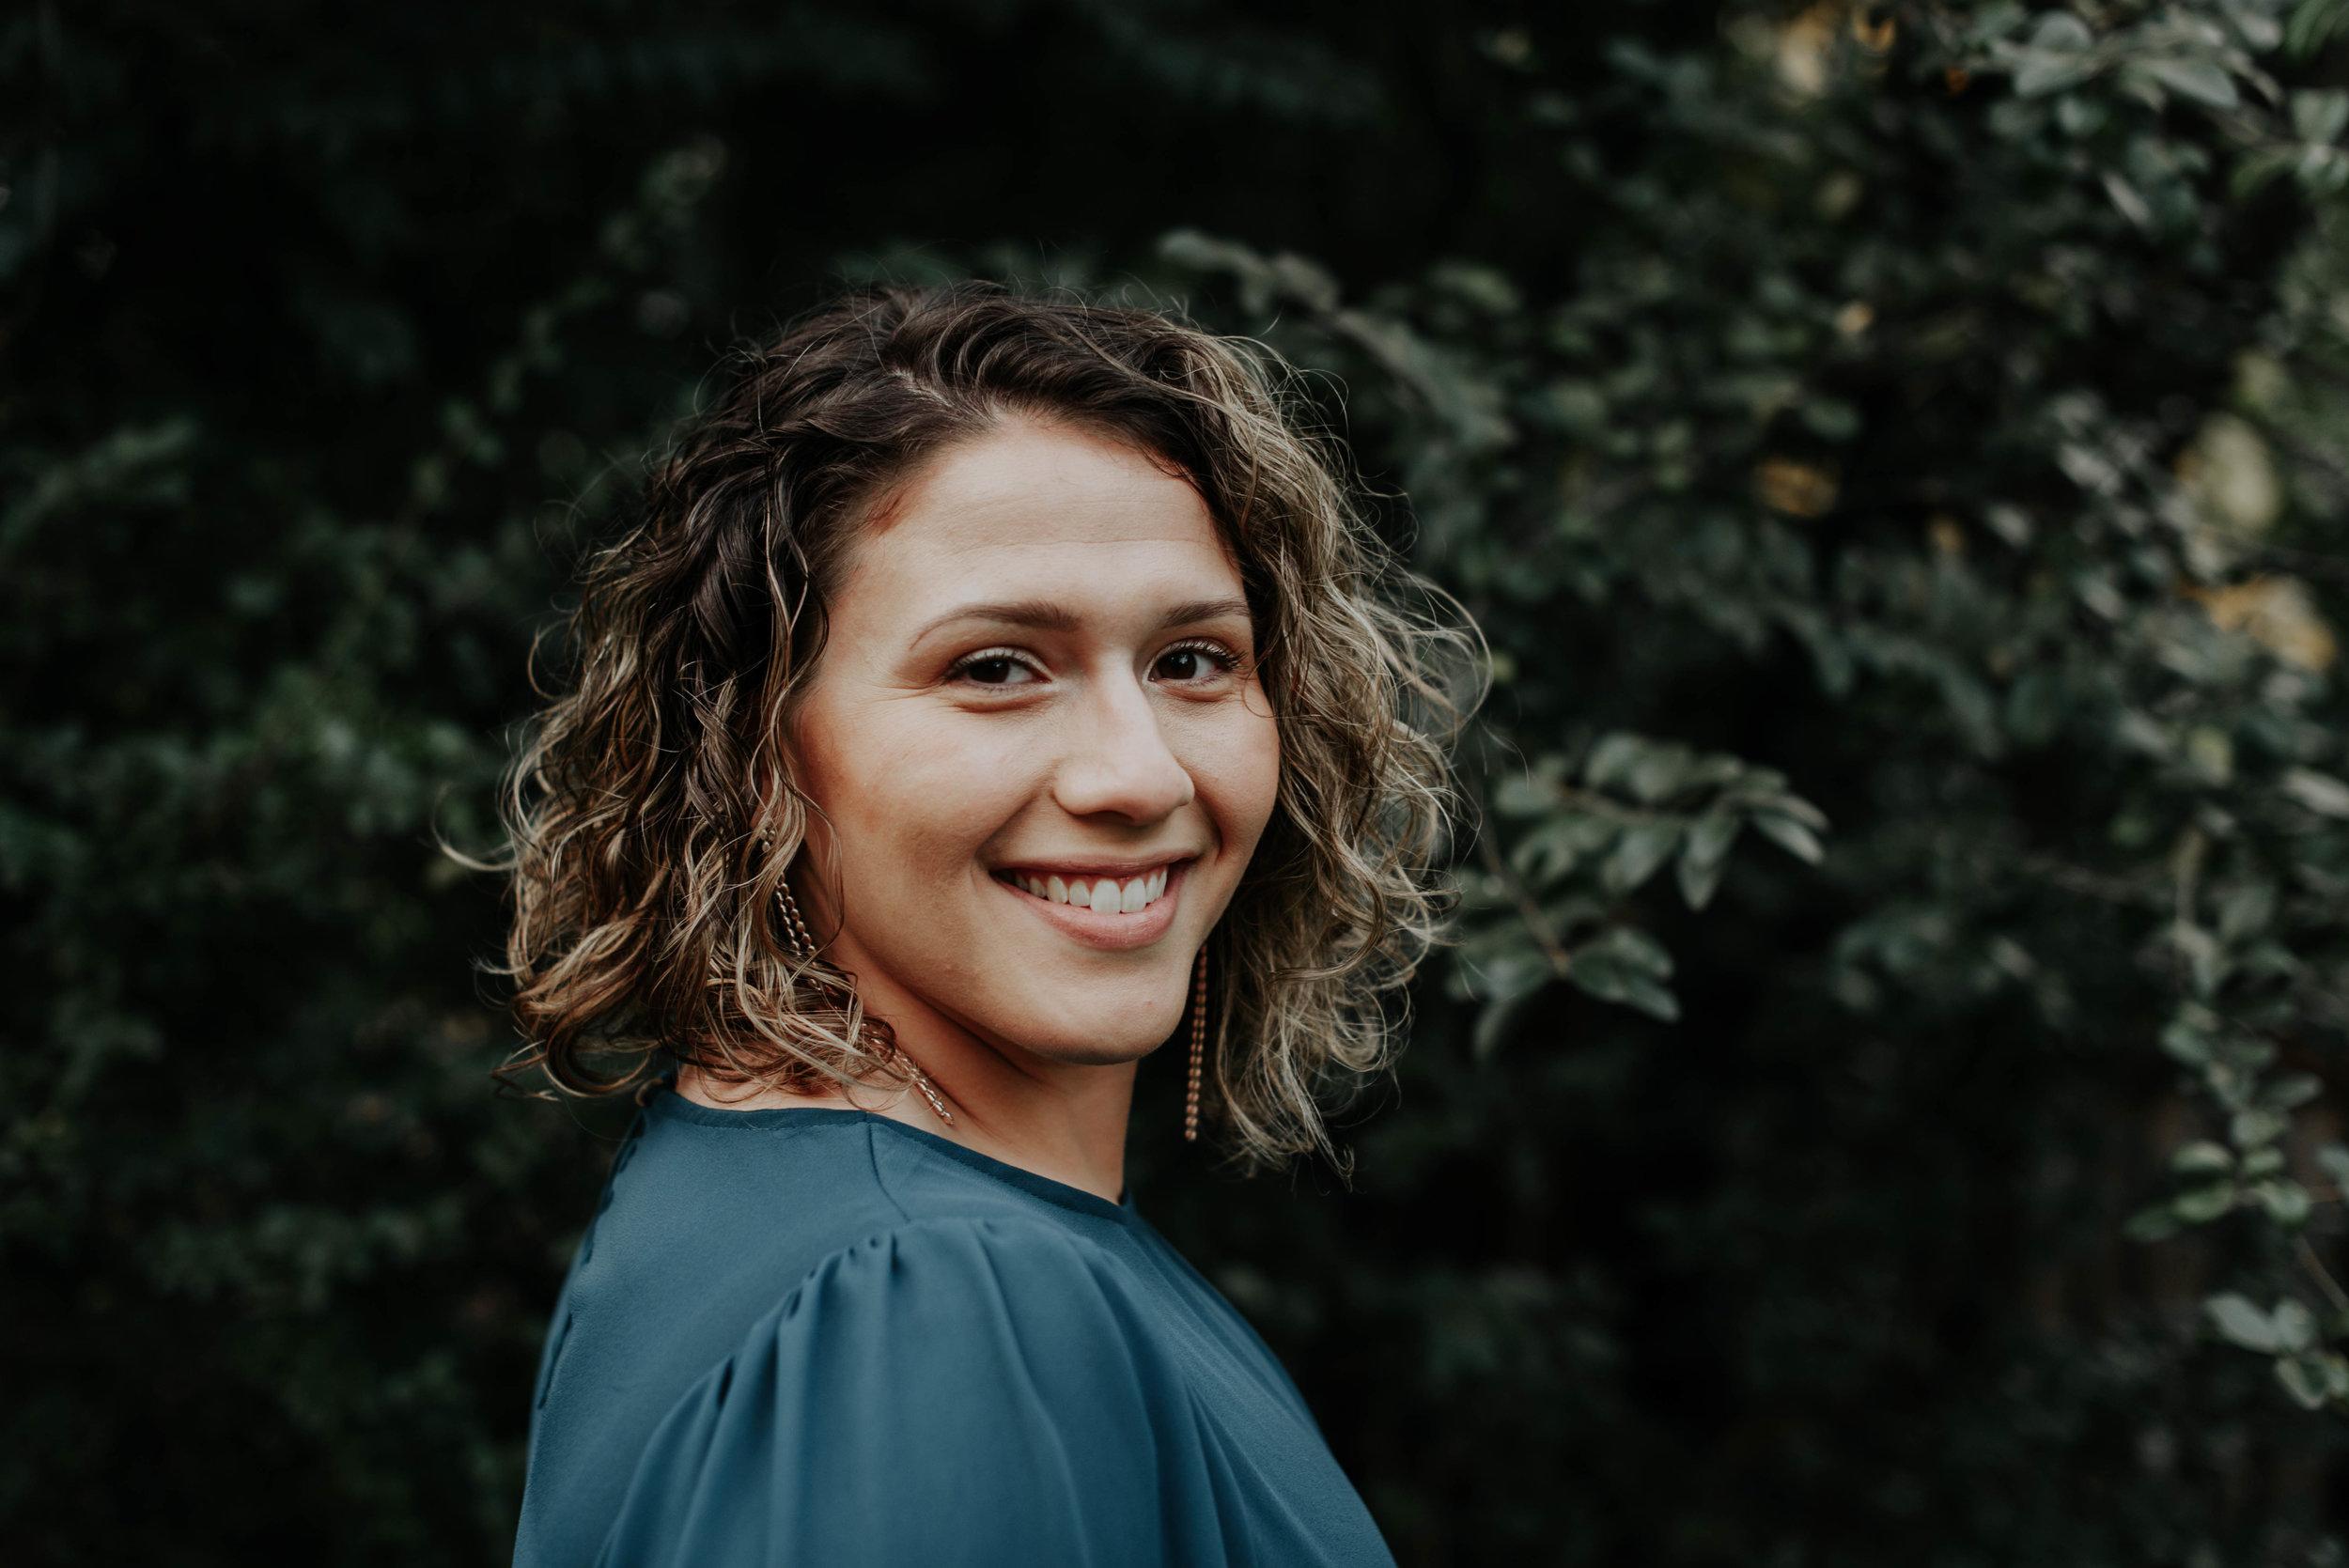 Erin-Kirkpatrick-Photography-Victoria-Graduation-Oct-2017-18.jpg